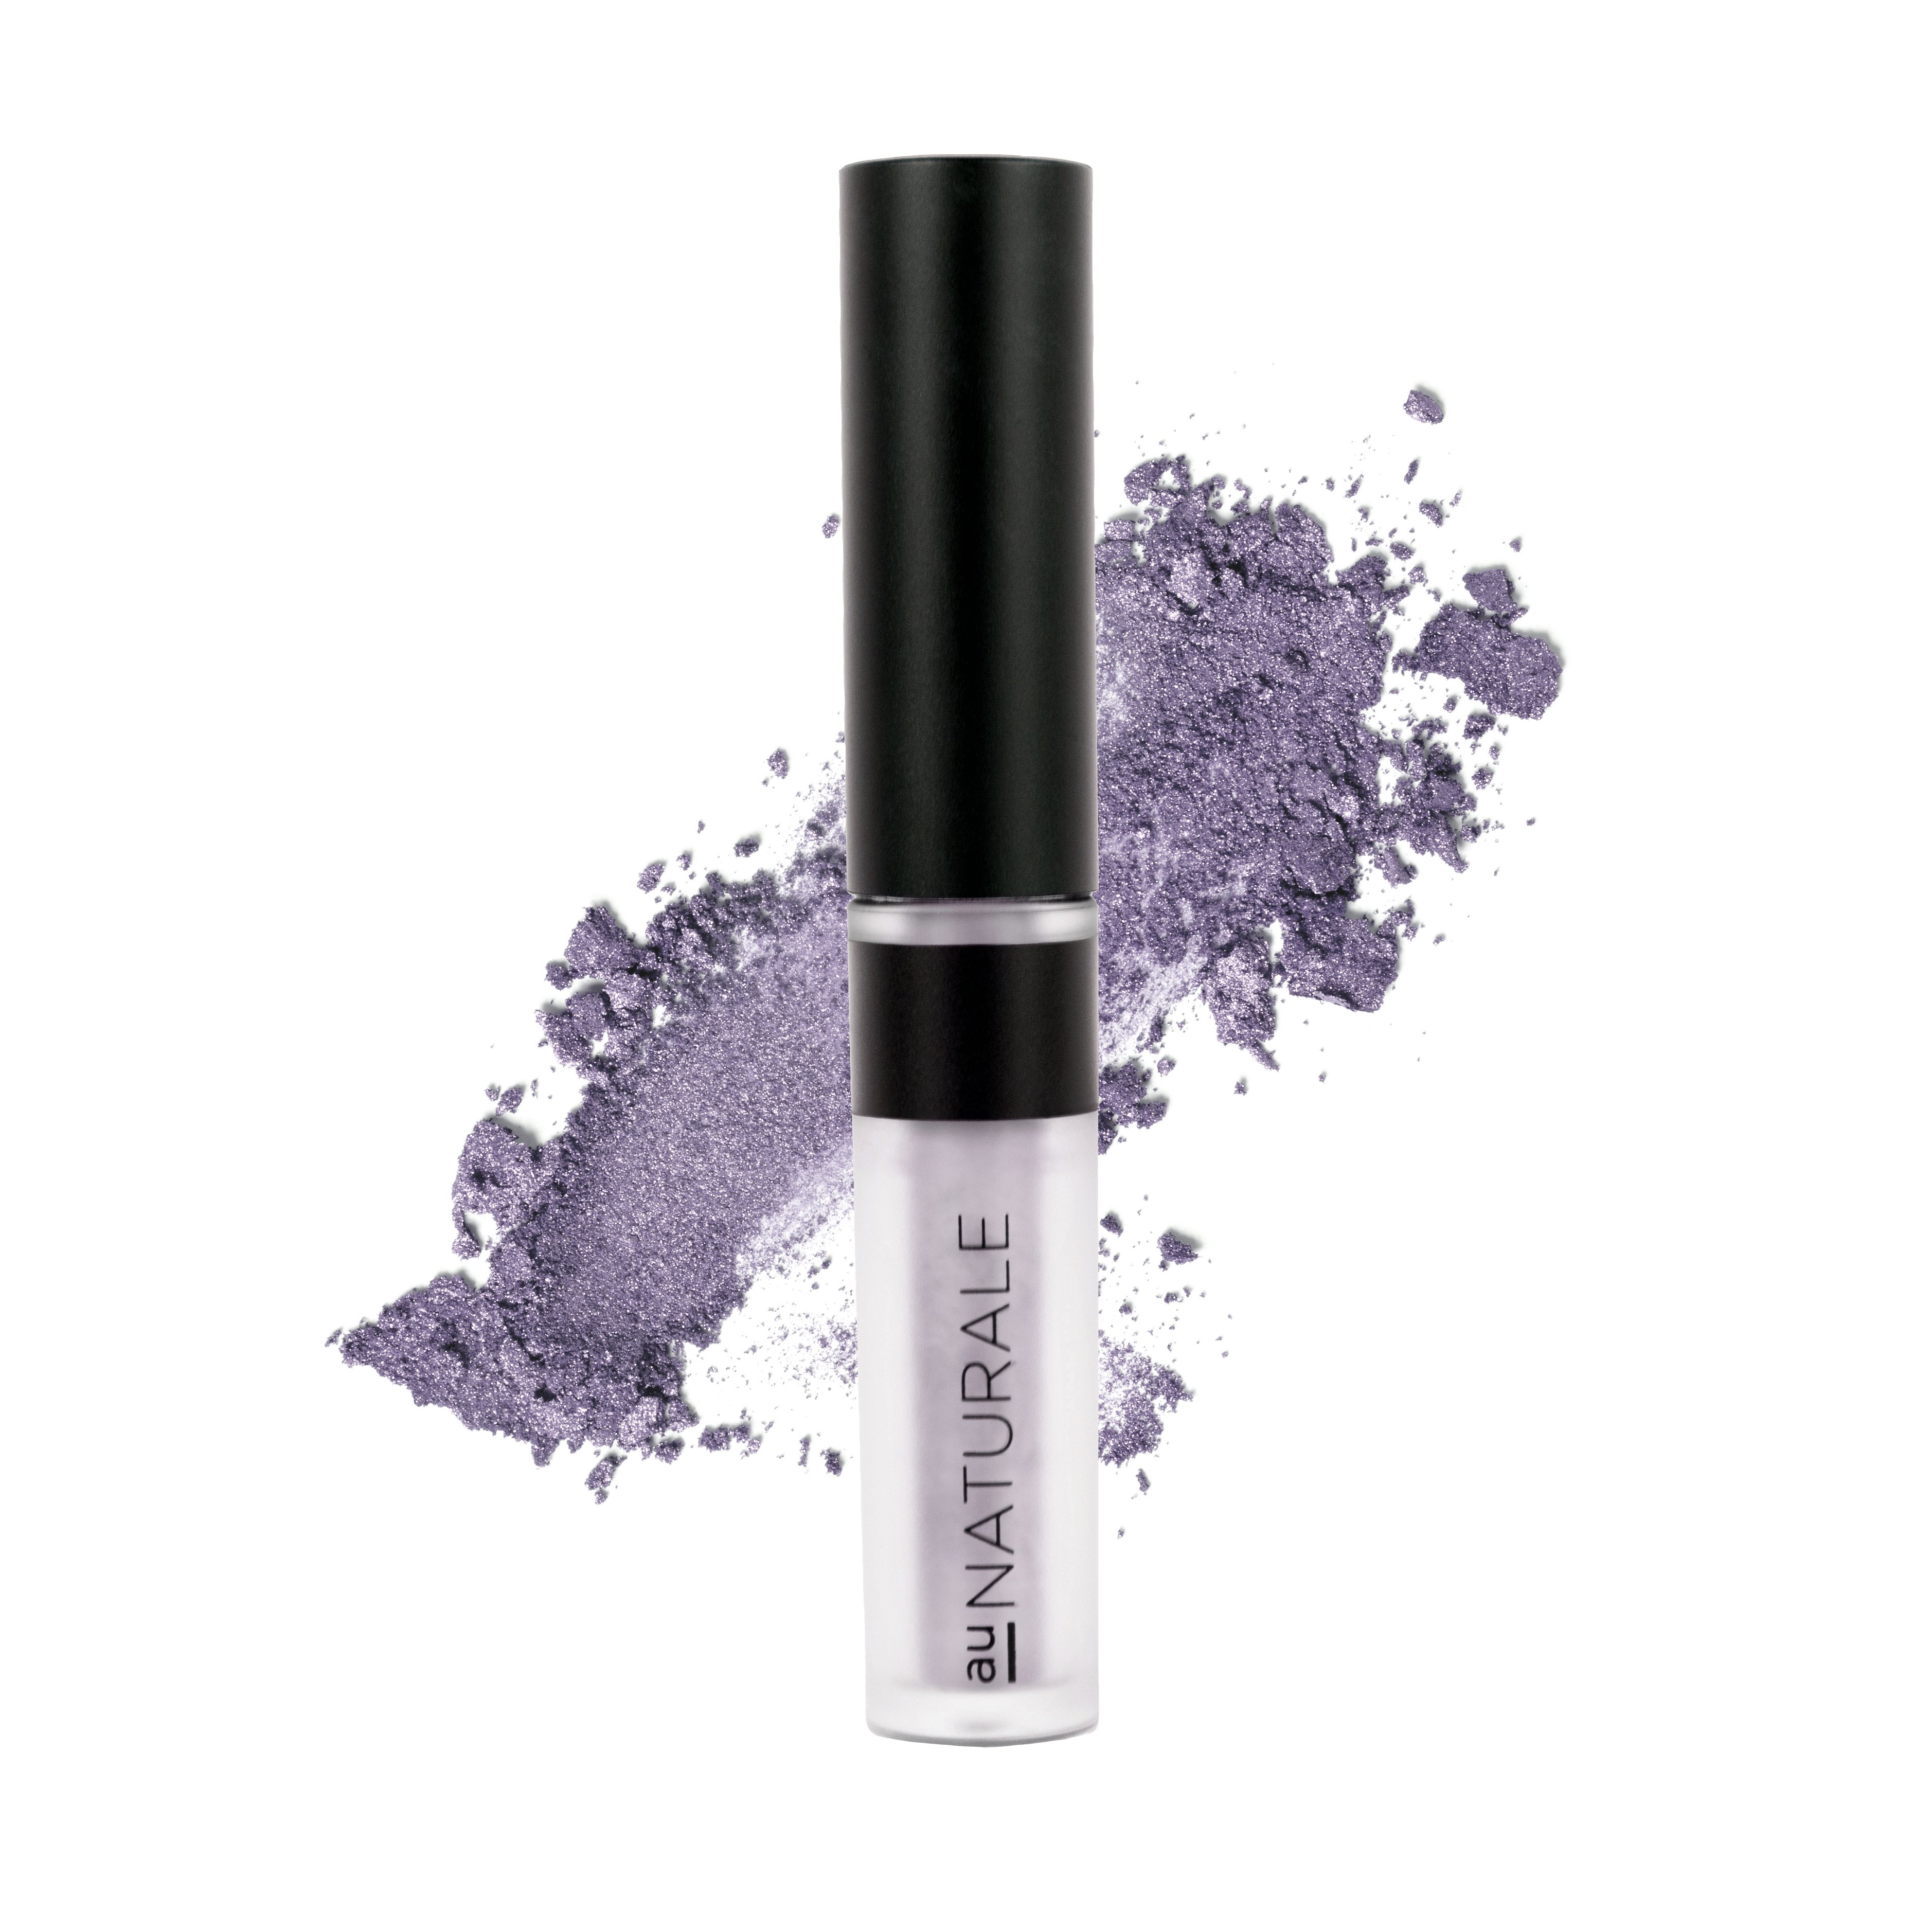 Super Fine Powder Eye Shadow - African Violet Image